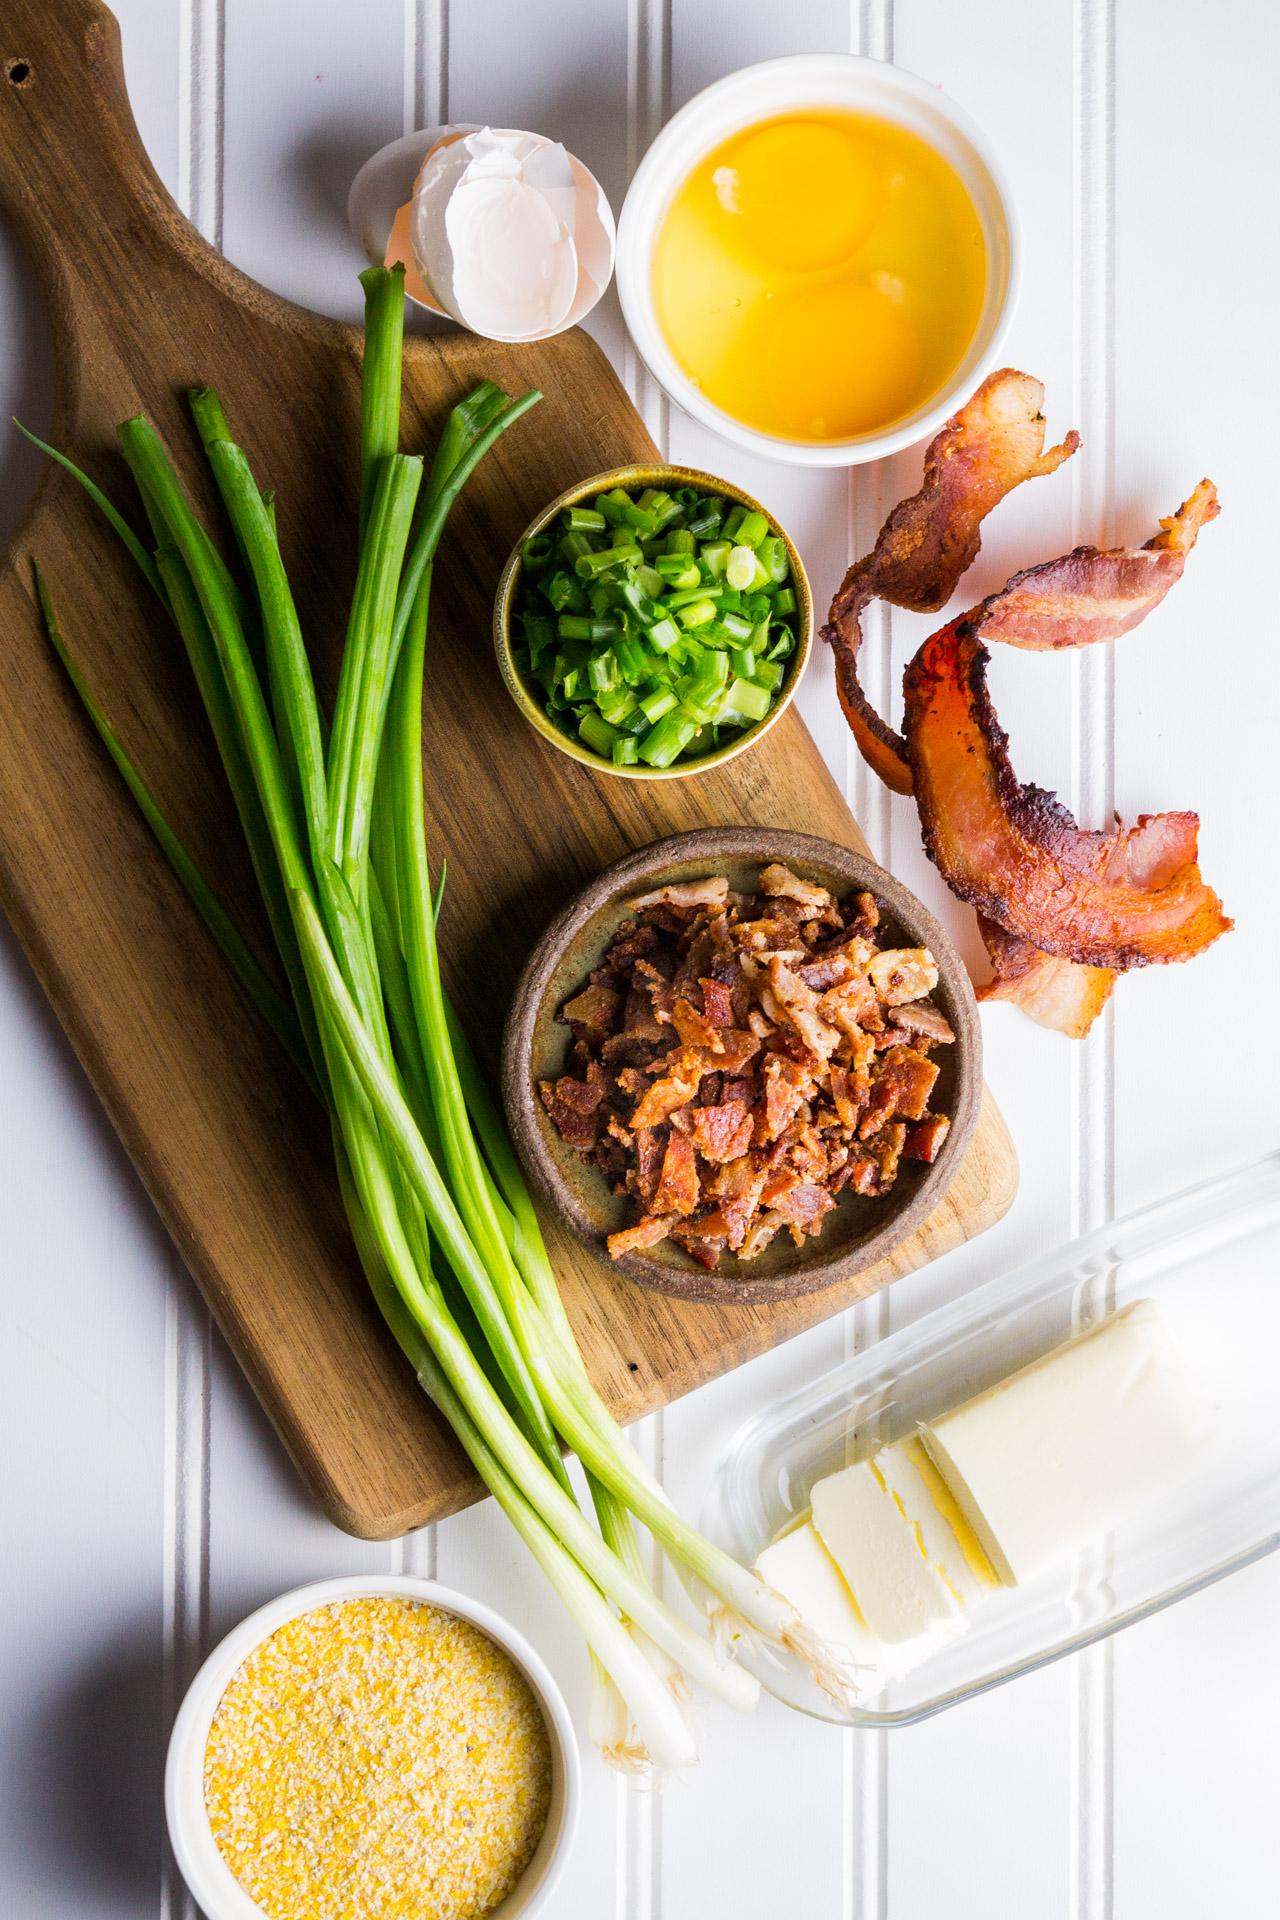 cornbread-bacon-scallions-2.jpg